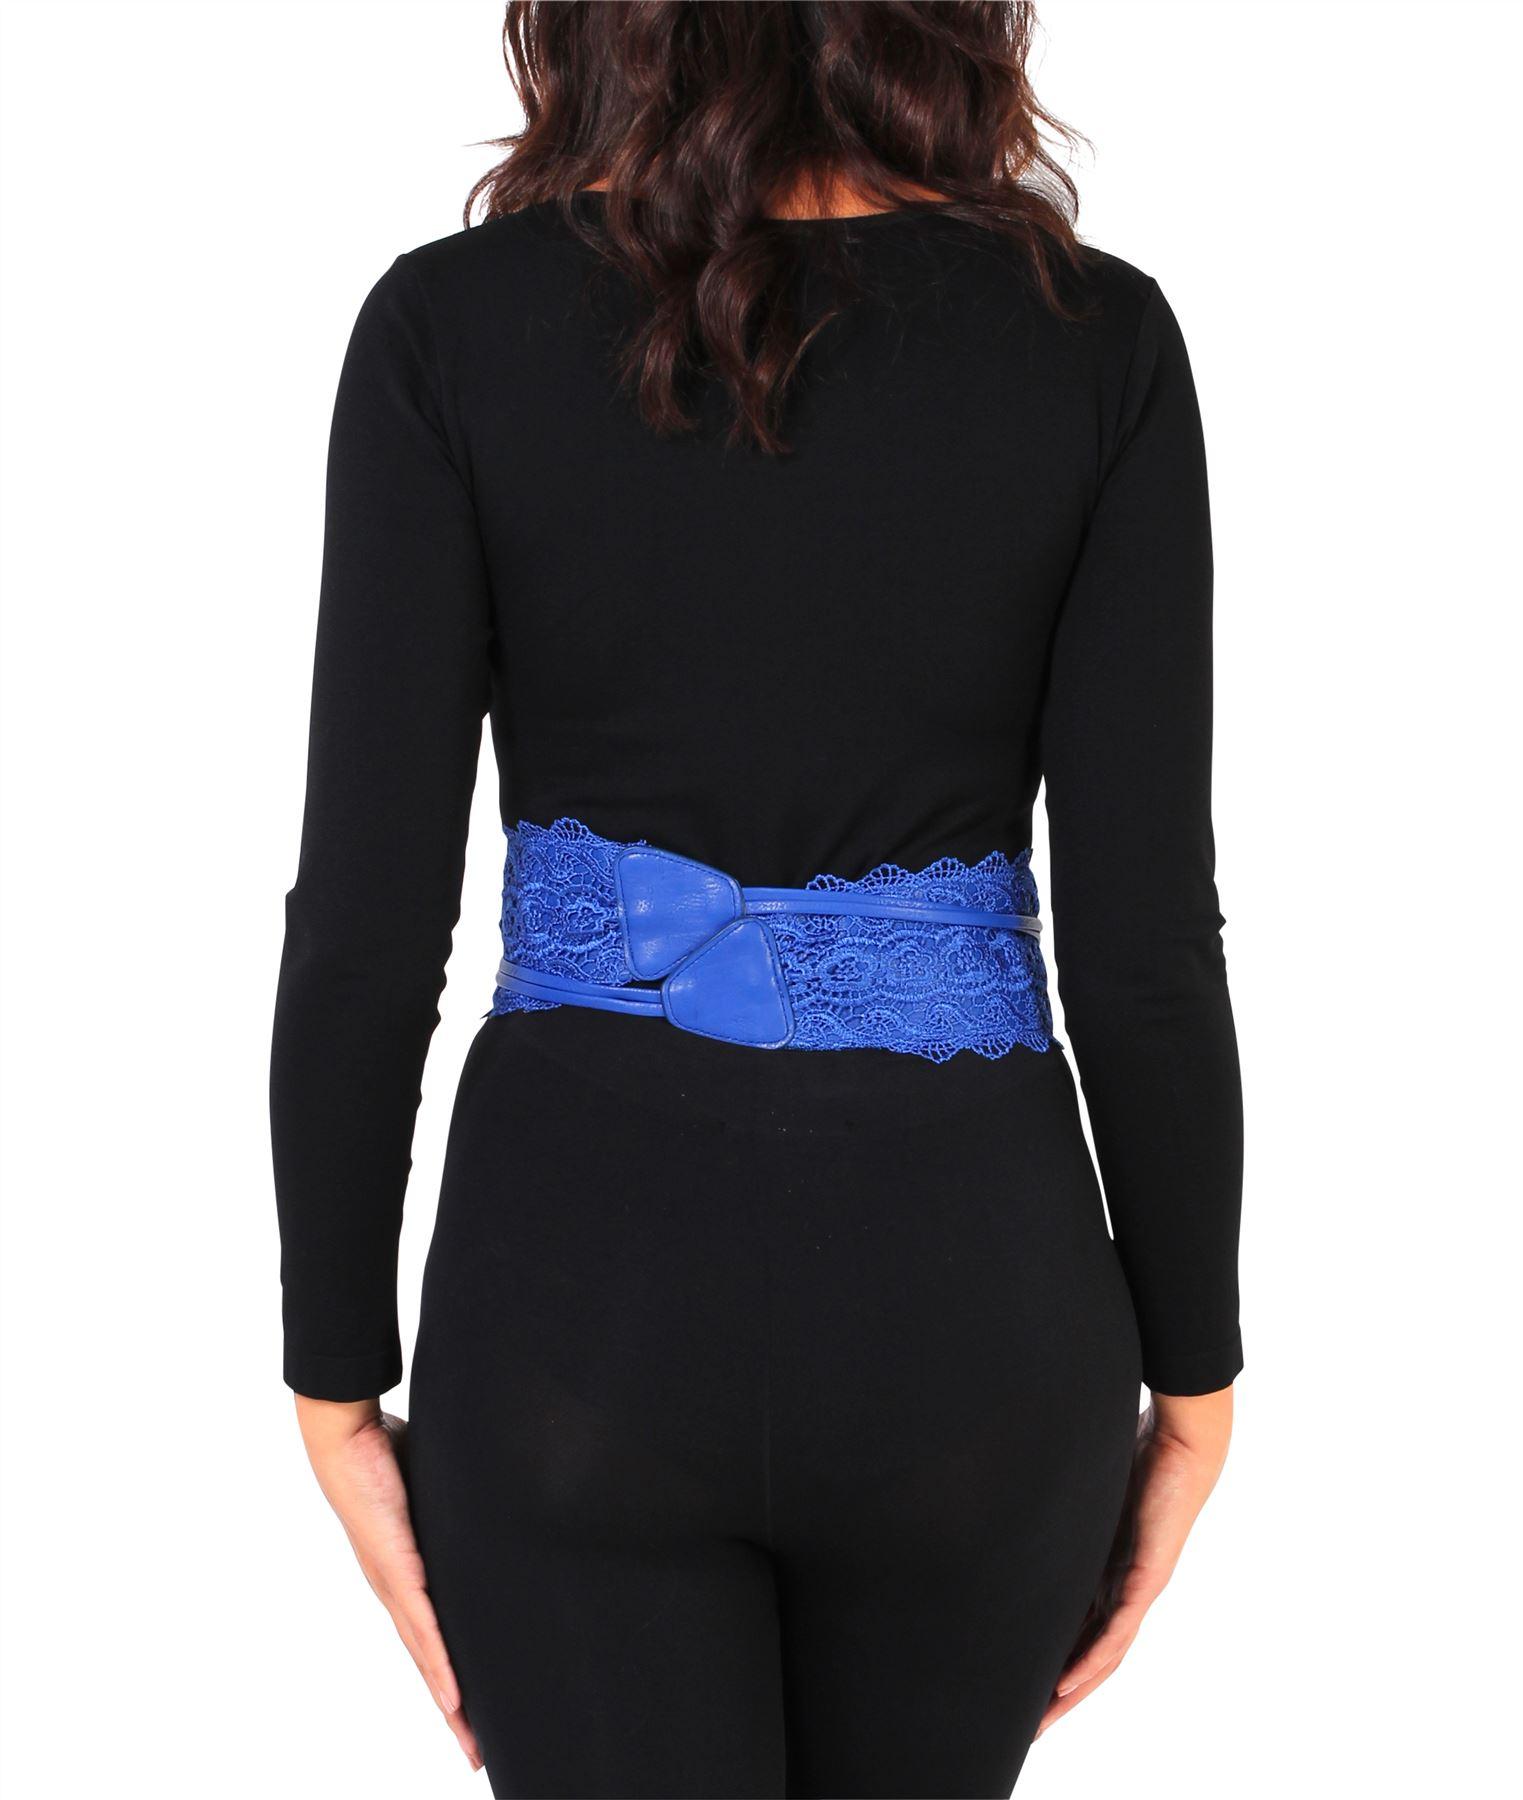 thumbnail 53 - Womens-Ladies-Wide-Waist-Belt-Floral-Waistband-Pattern-Band-Crochet-Lace-Corset